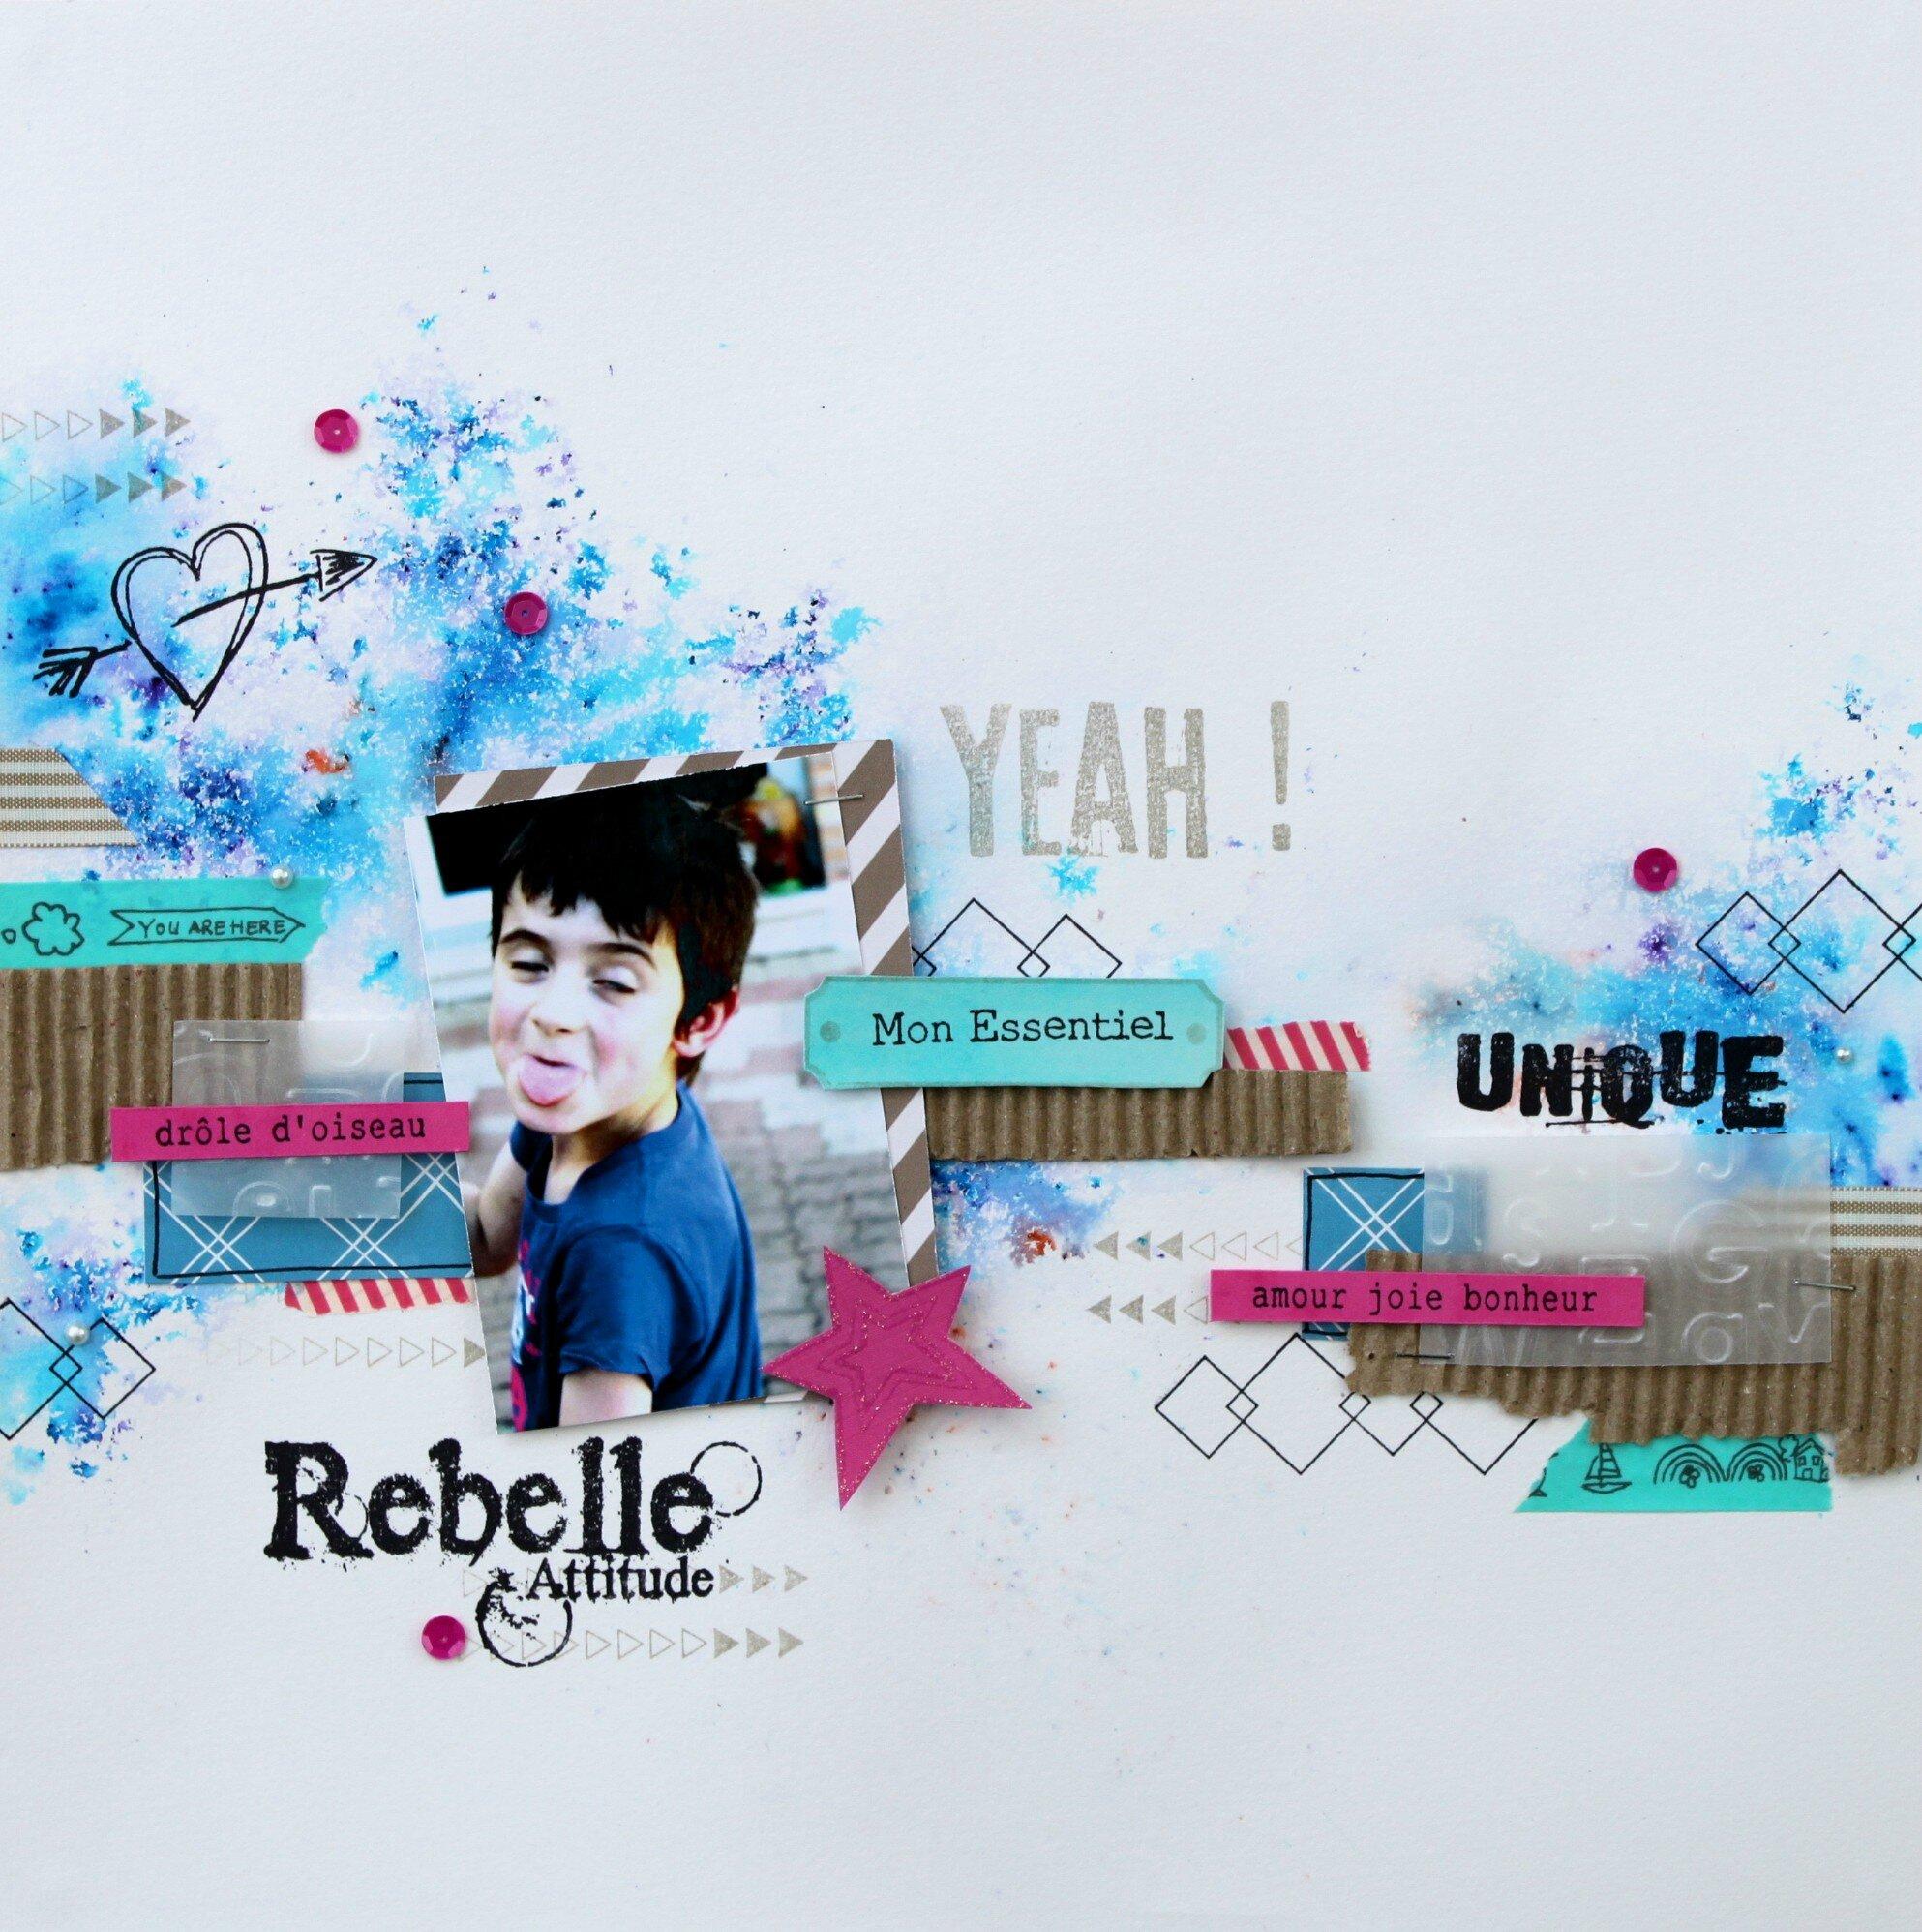 rebelle attitude